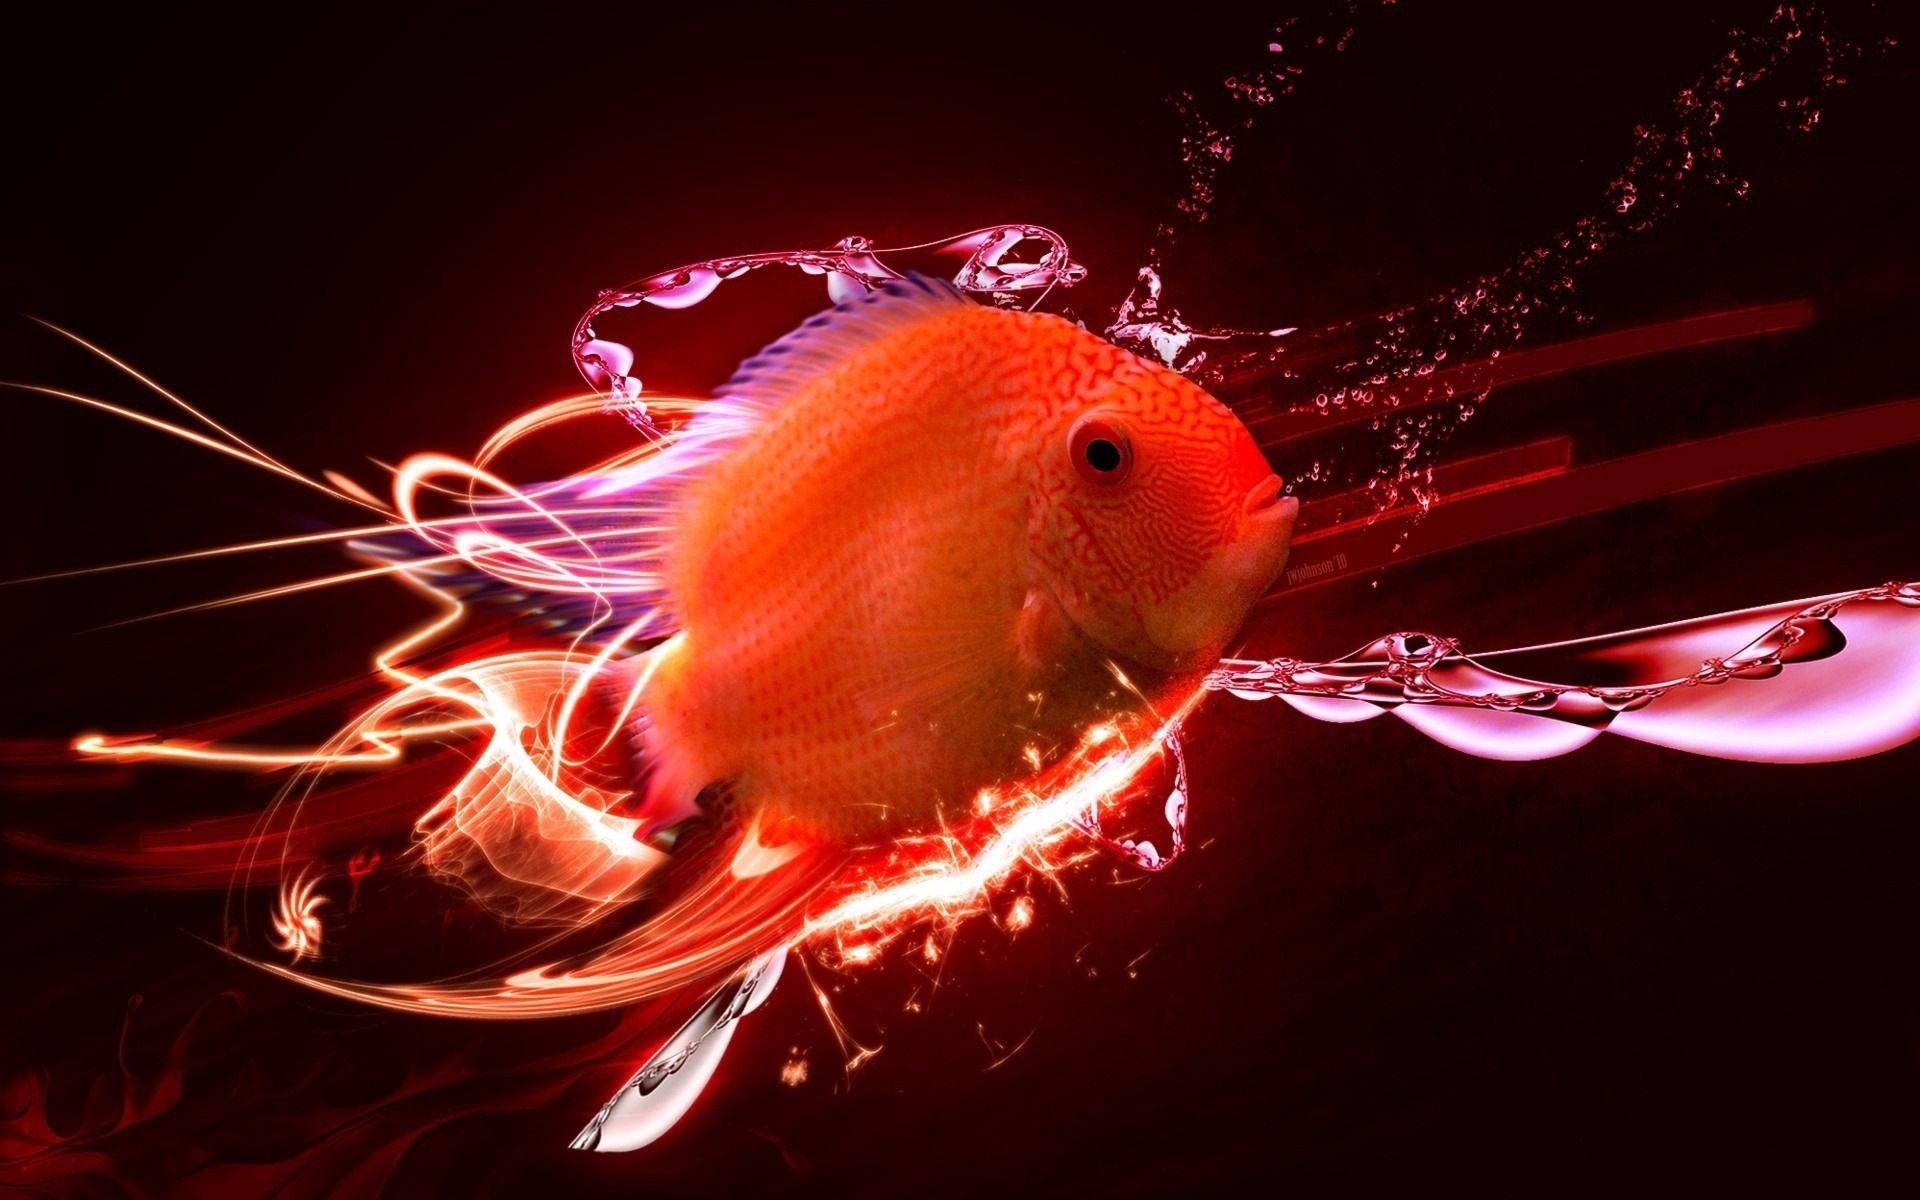 Betta Fish Wallpaper Iphone 6 And Iphone 6s Fish Wallpaper Iphone Betta Fish Fish Wallpaper